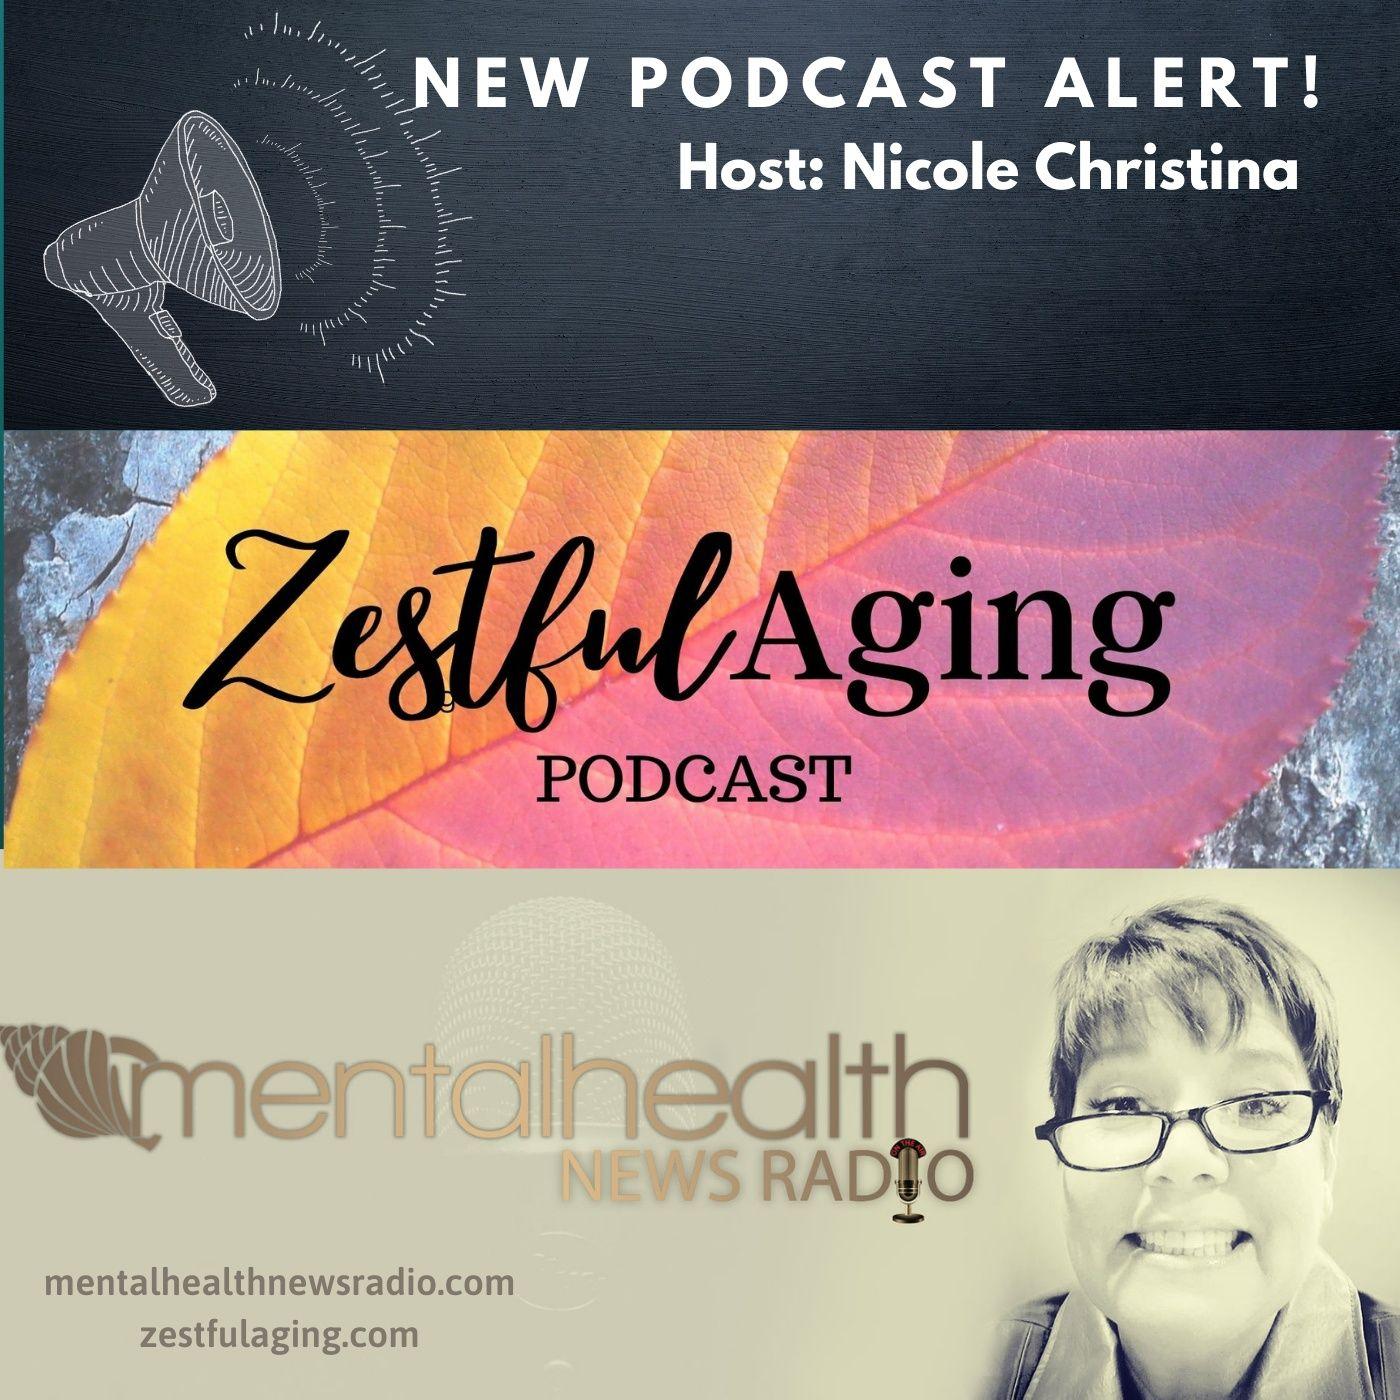 Mental Health News Radio - Zestful Aging and Mental Health